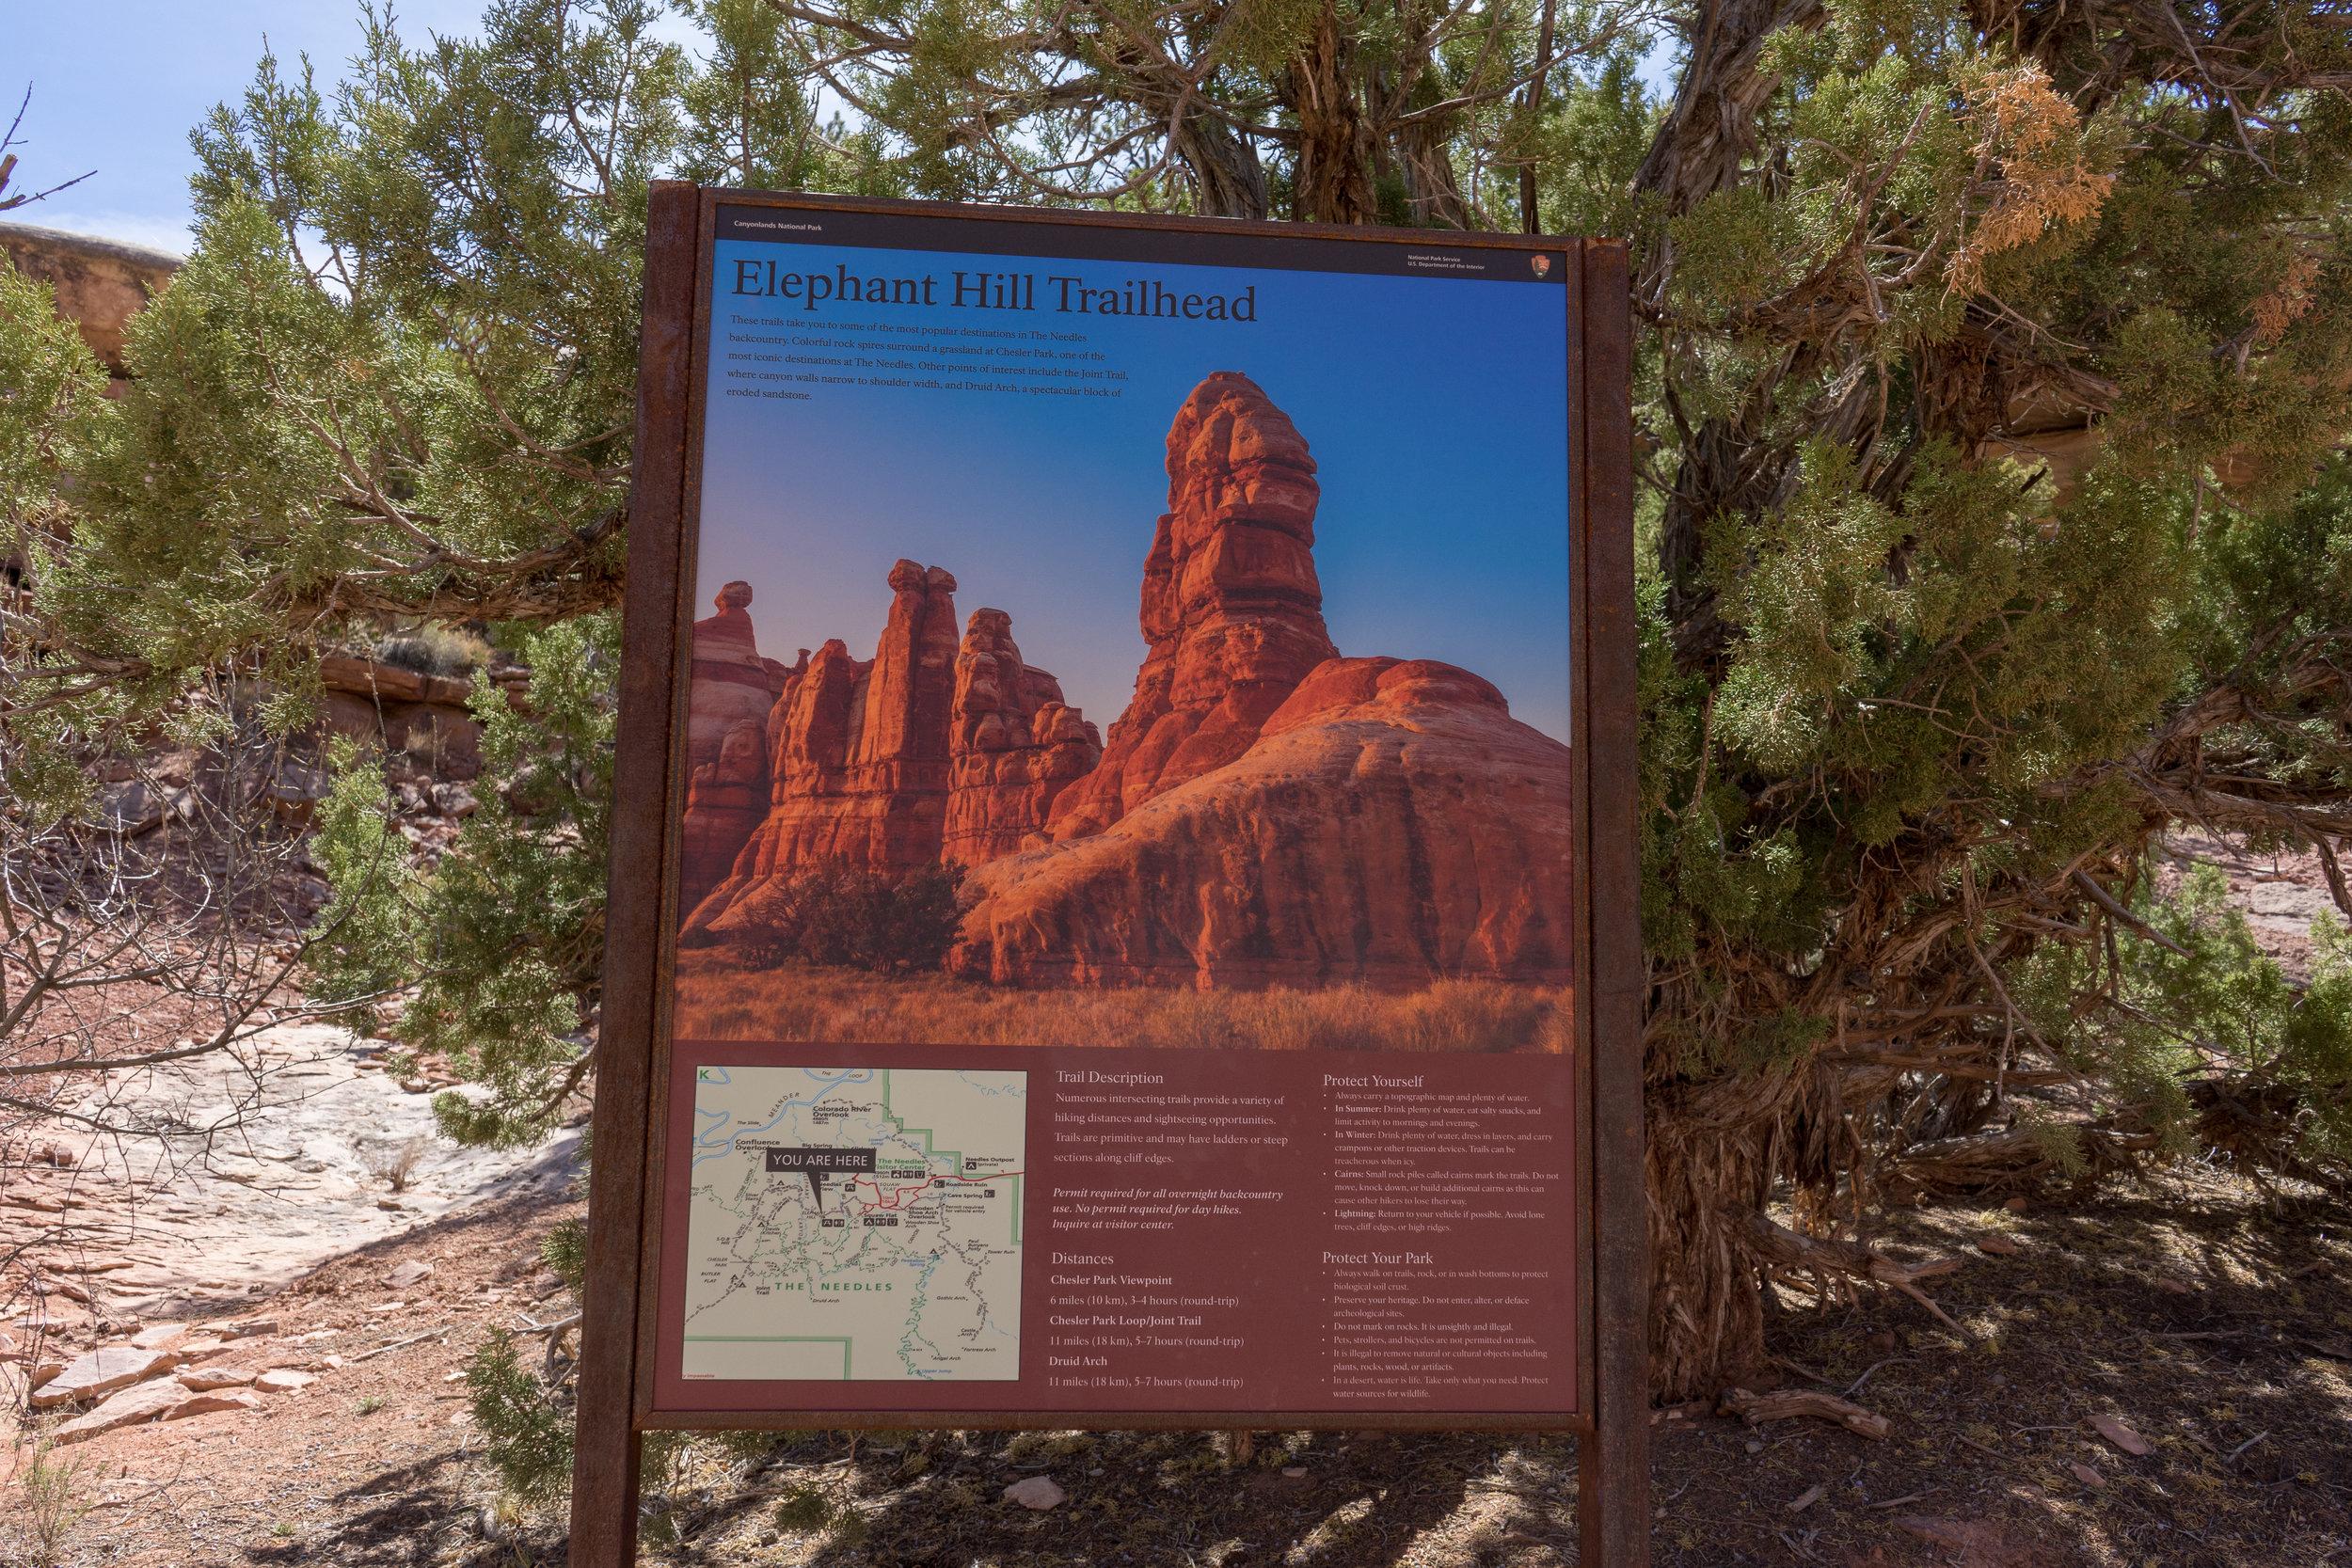 Elephant Hill Trailhead